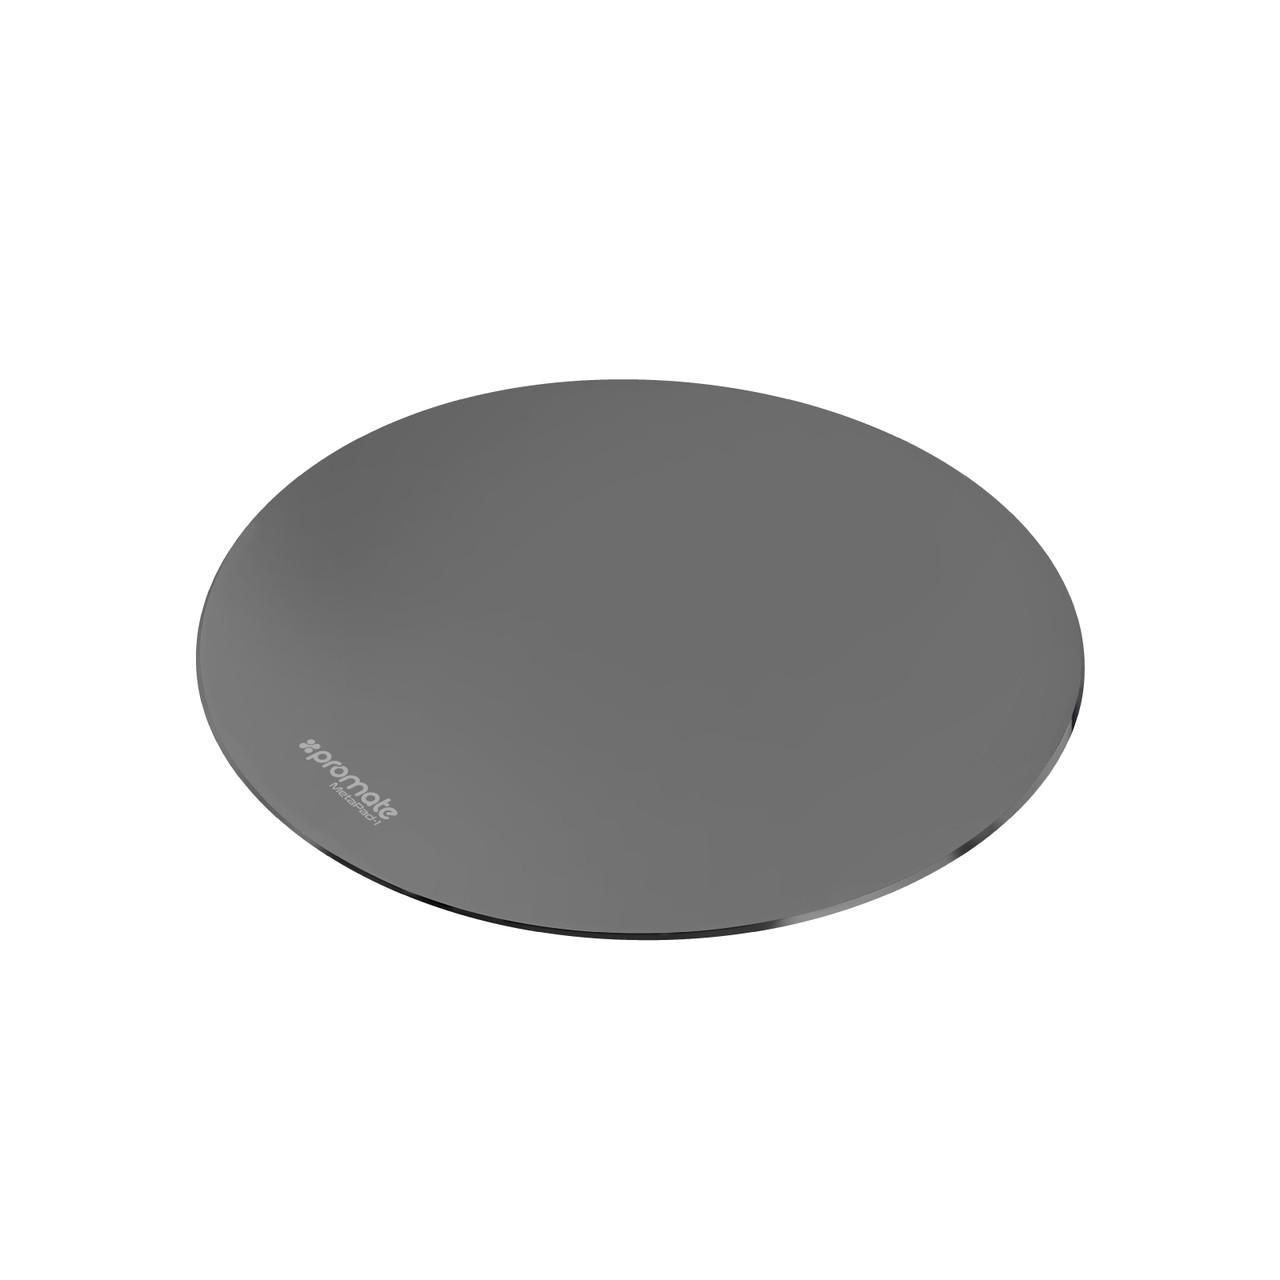 Игровая поверхность Promate metaPad-1 S